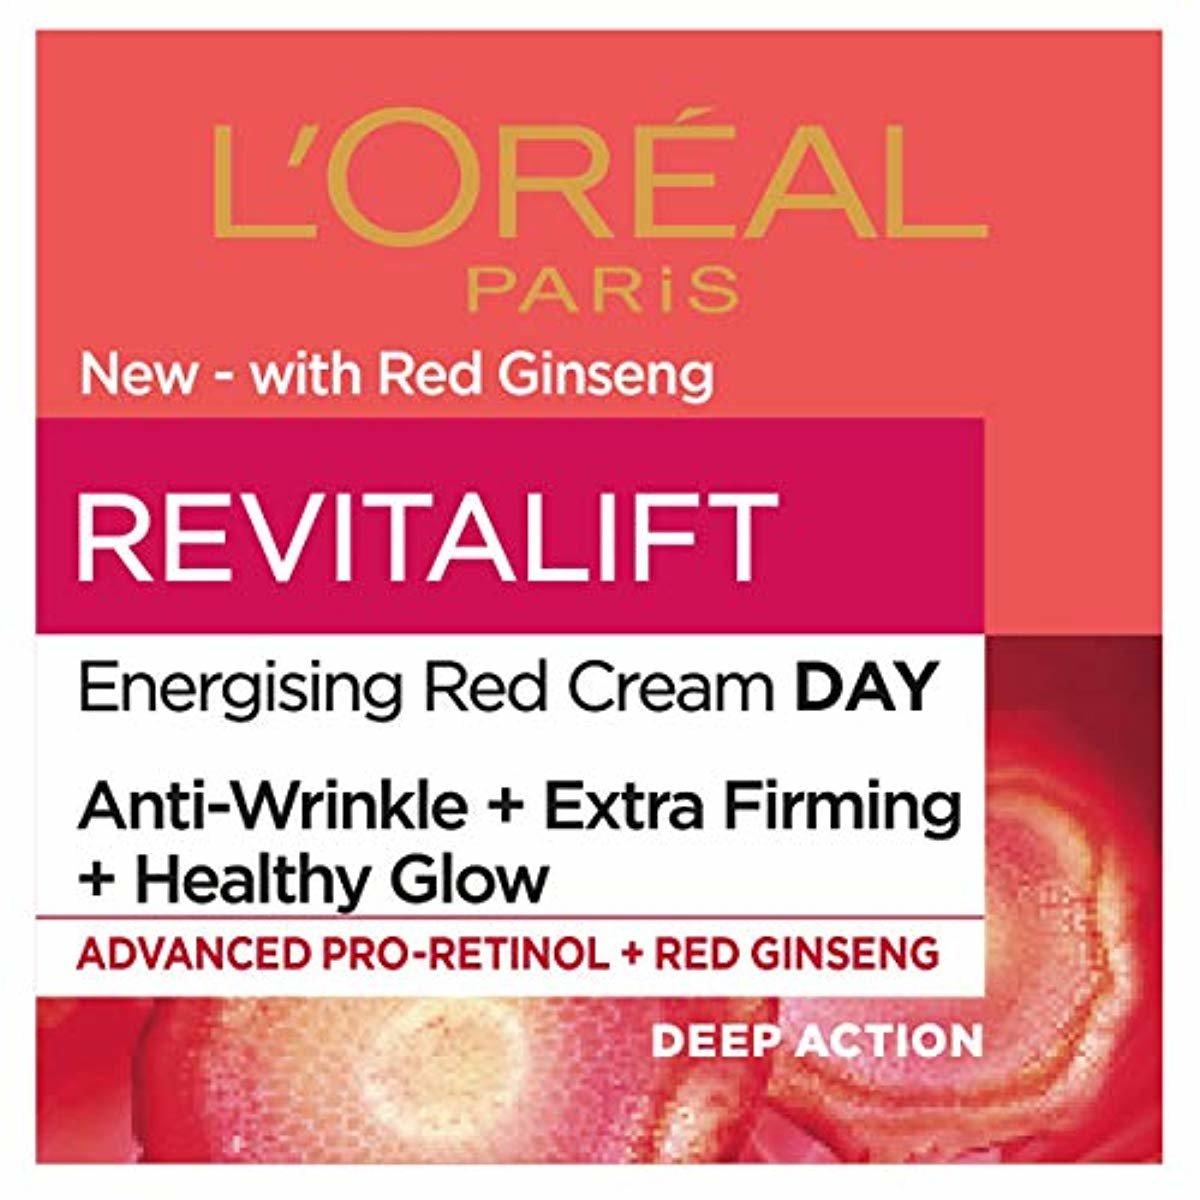 L'oreal Paris Revitalift Energising Red Cream Day Κρέμα Ημέρας με Αντιρυτιδική & Συσφικτική Δράση 50ml